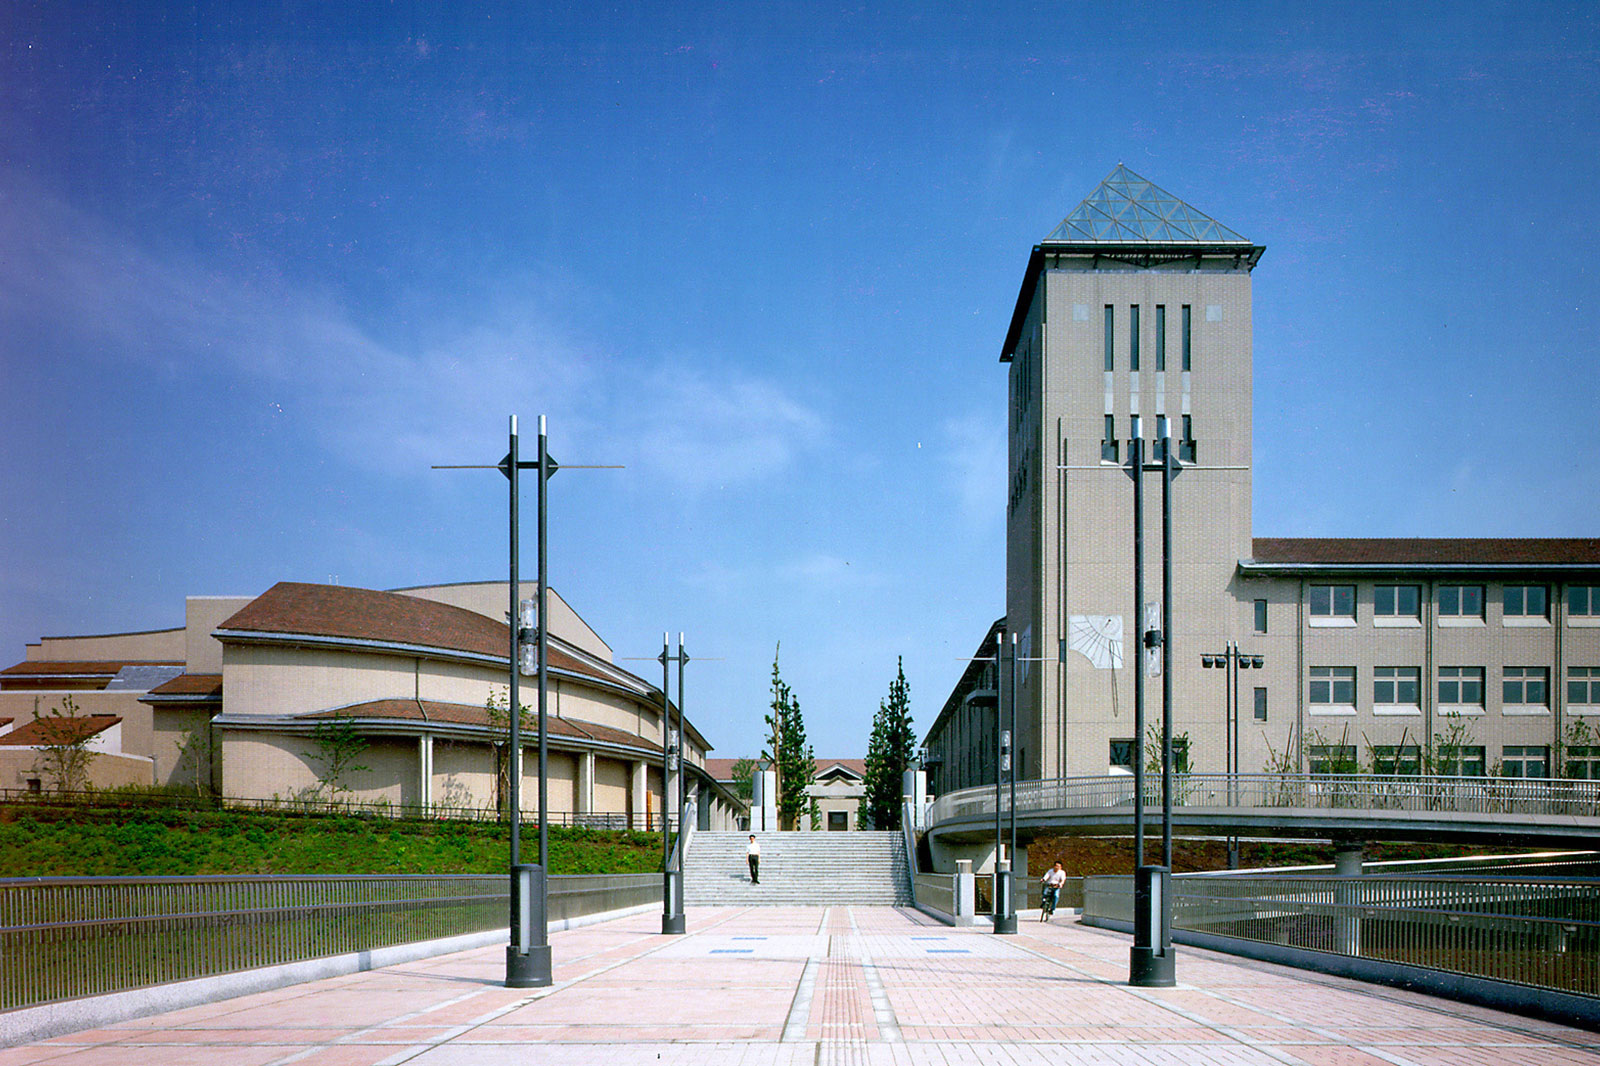 東京都立大学(現 首都大学東京南大沢キャンパス)